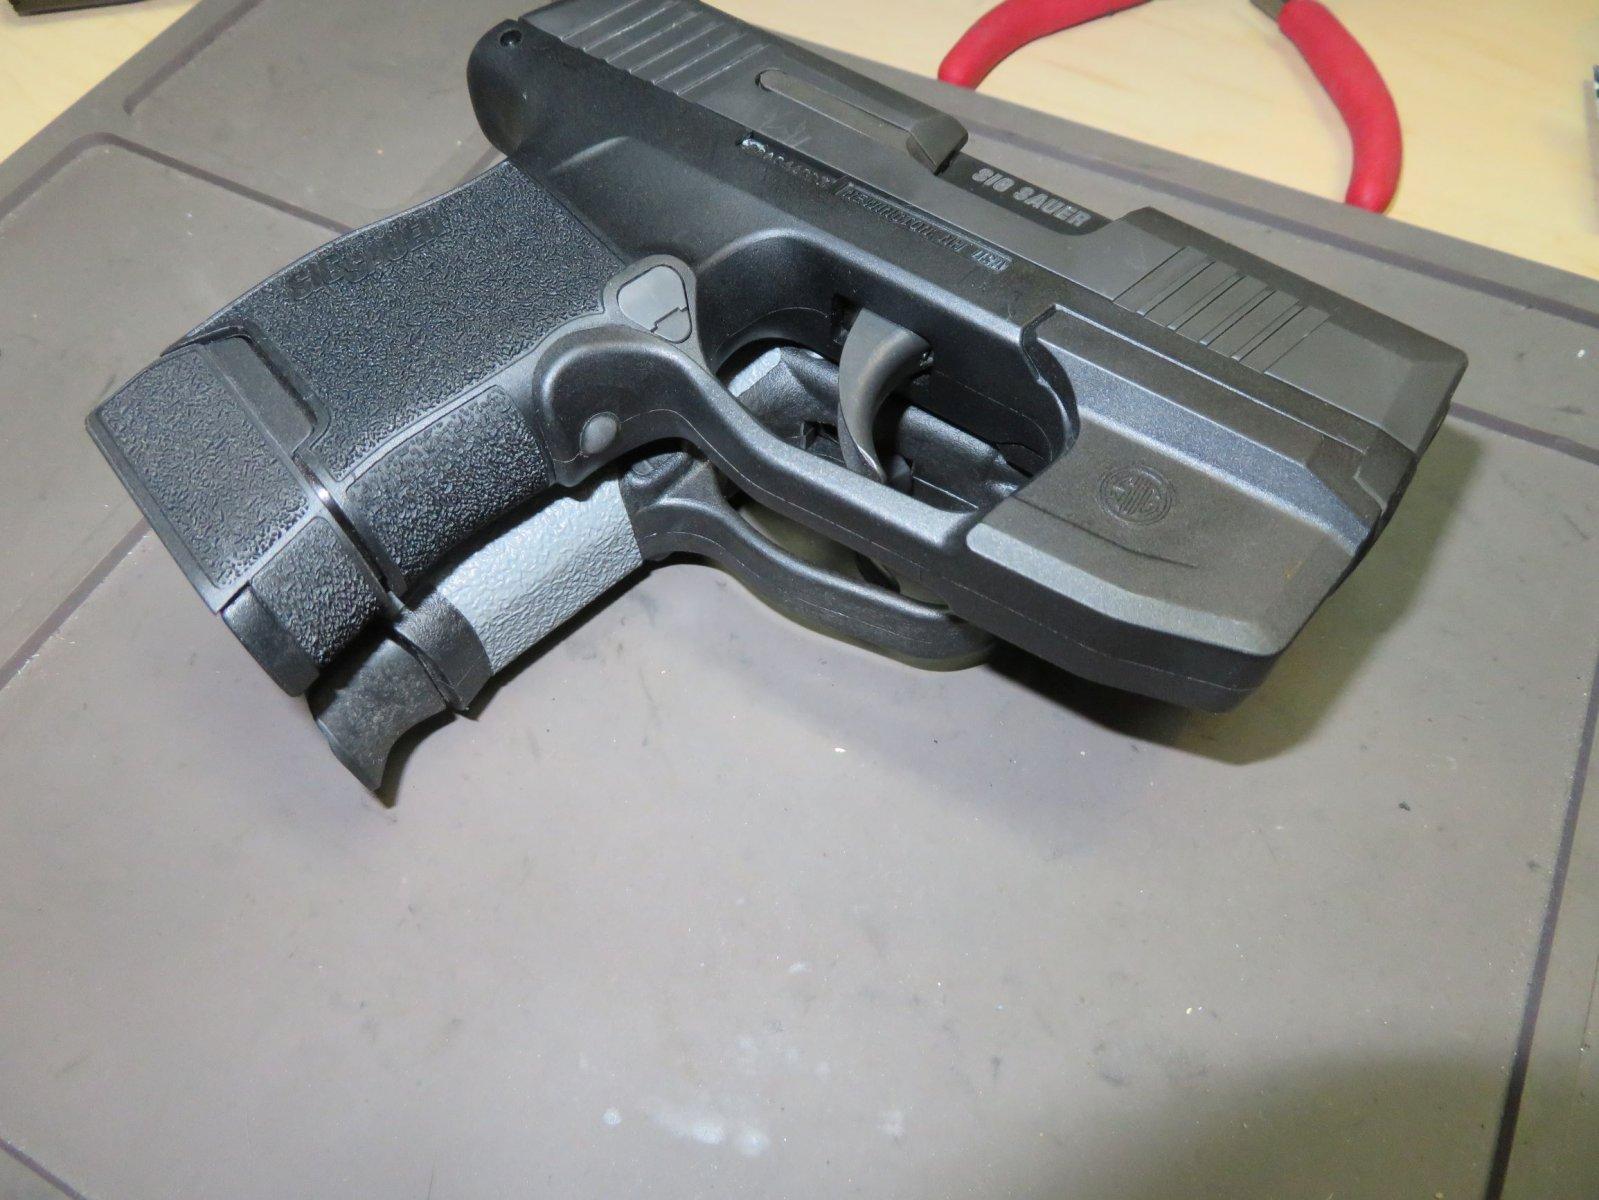 SIG P365 vs Kel-Tec P11 | The Leading Glock Forum and